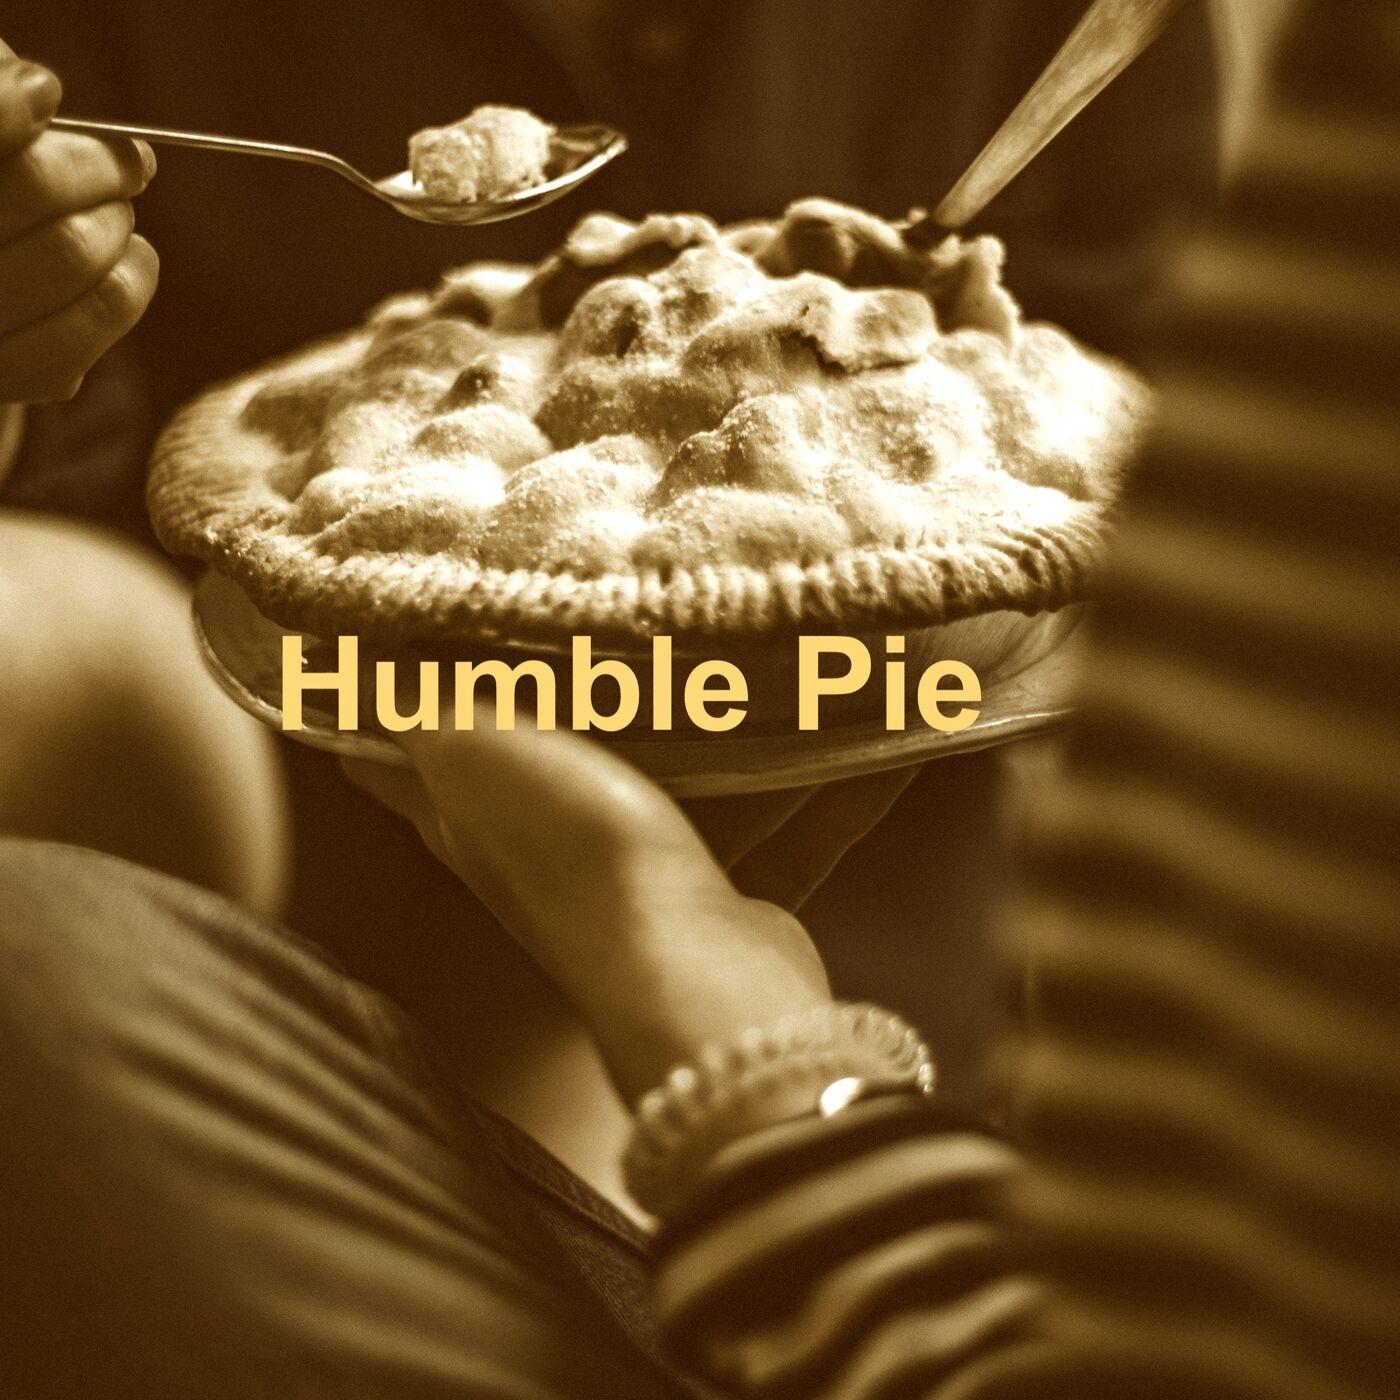 Humble Pie - Episode #39